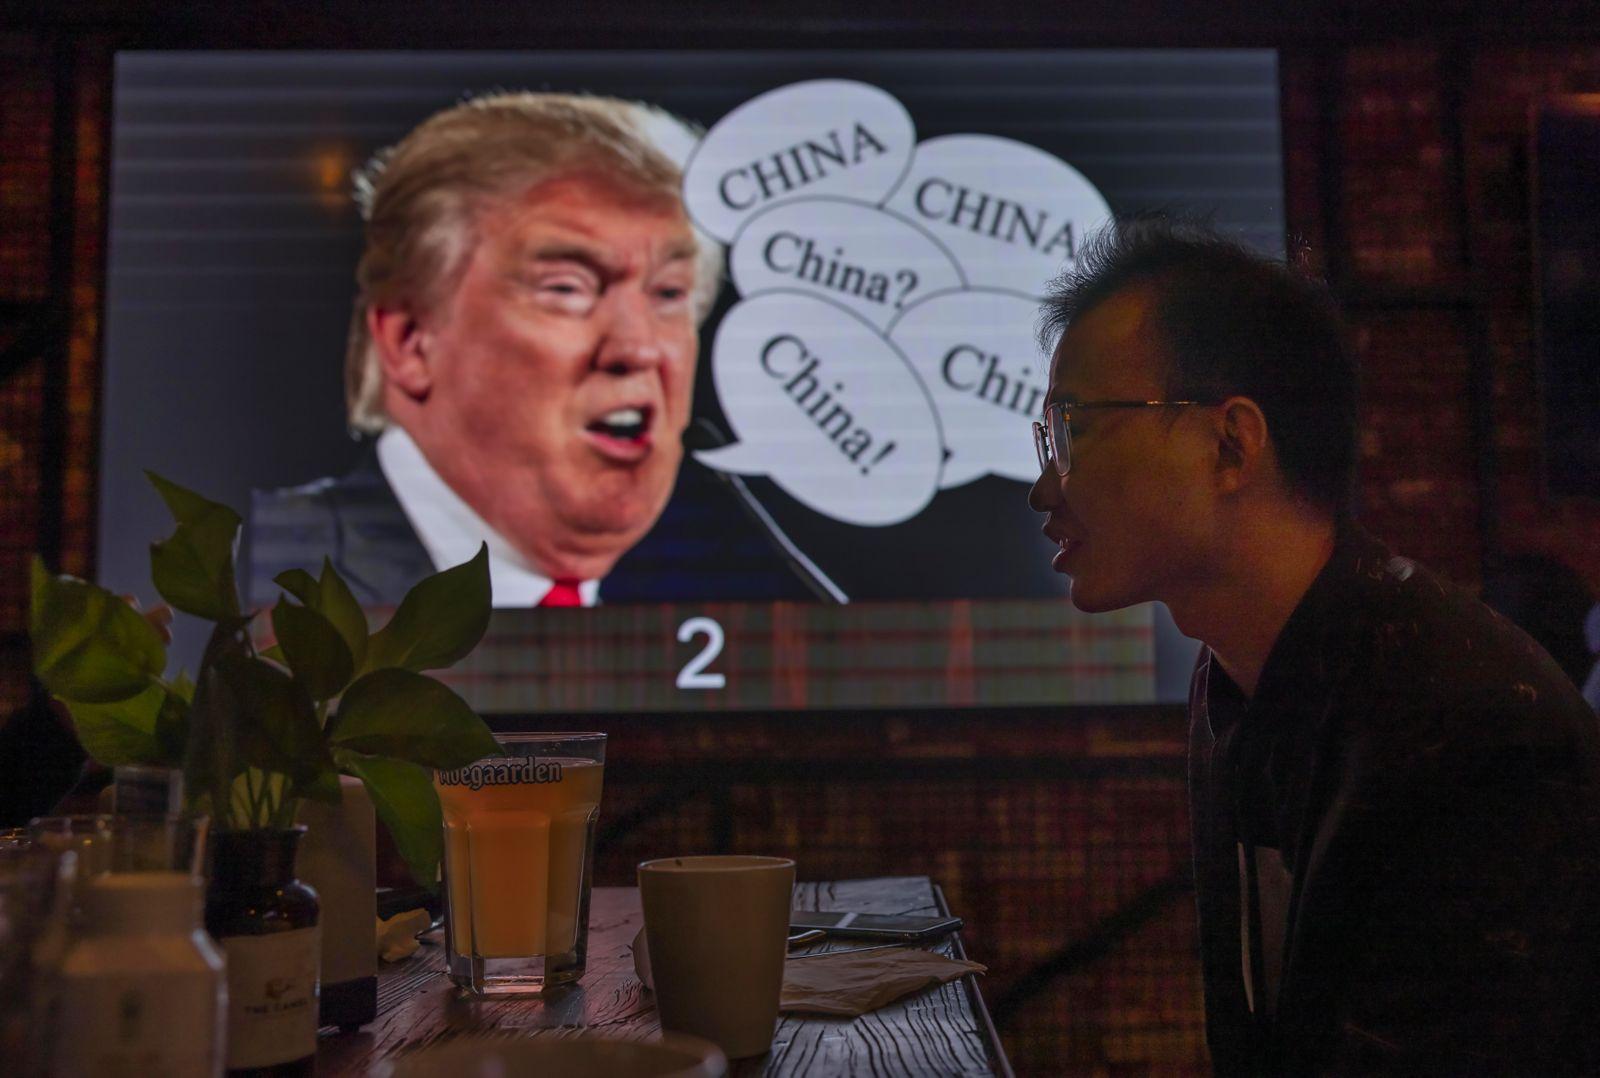 US Presidential trivia quiz in Shanghai, China - 03 Nov 2020